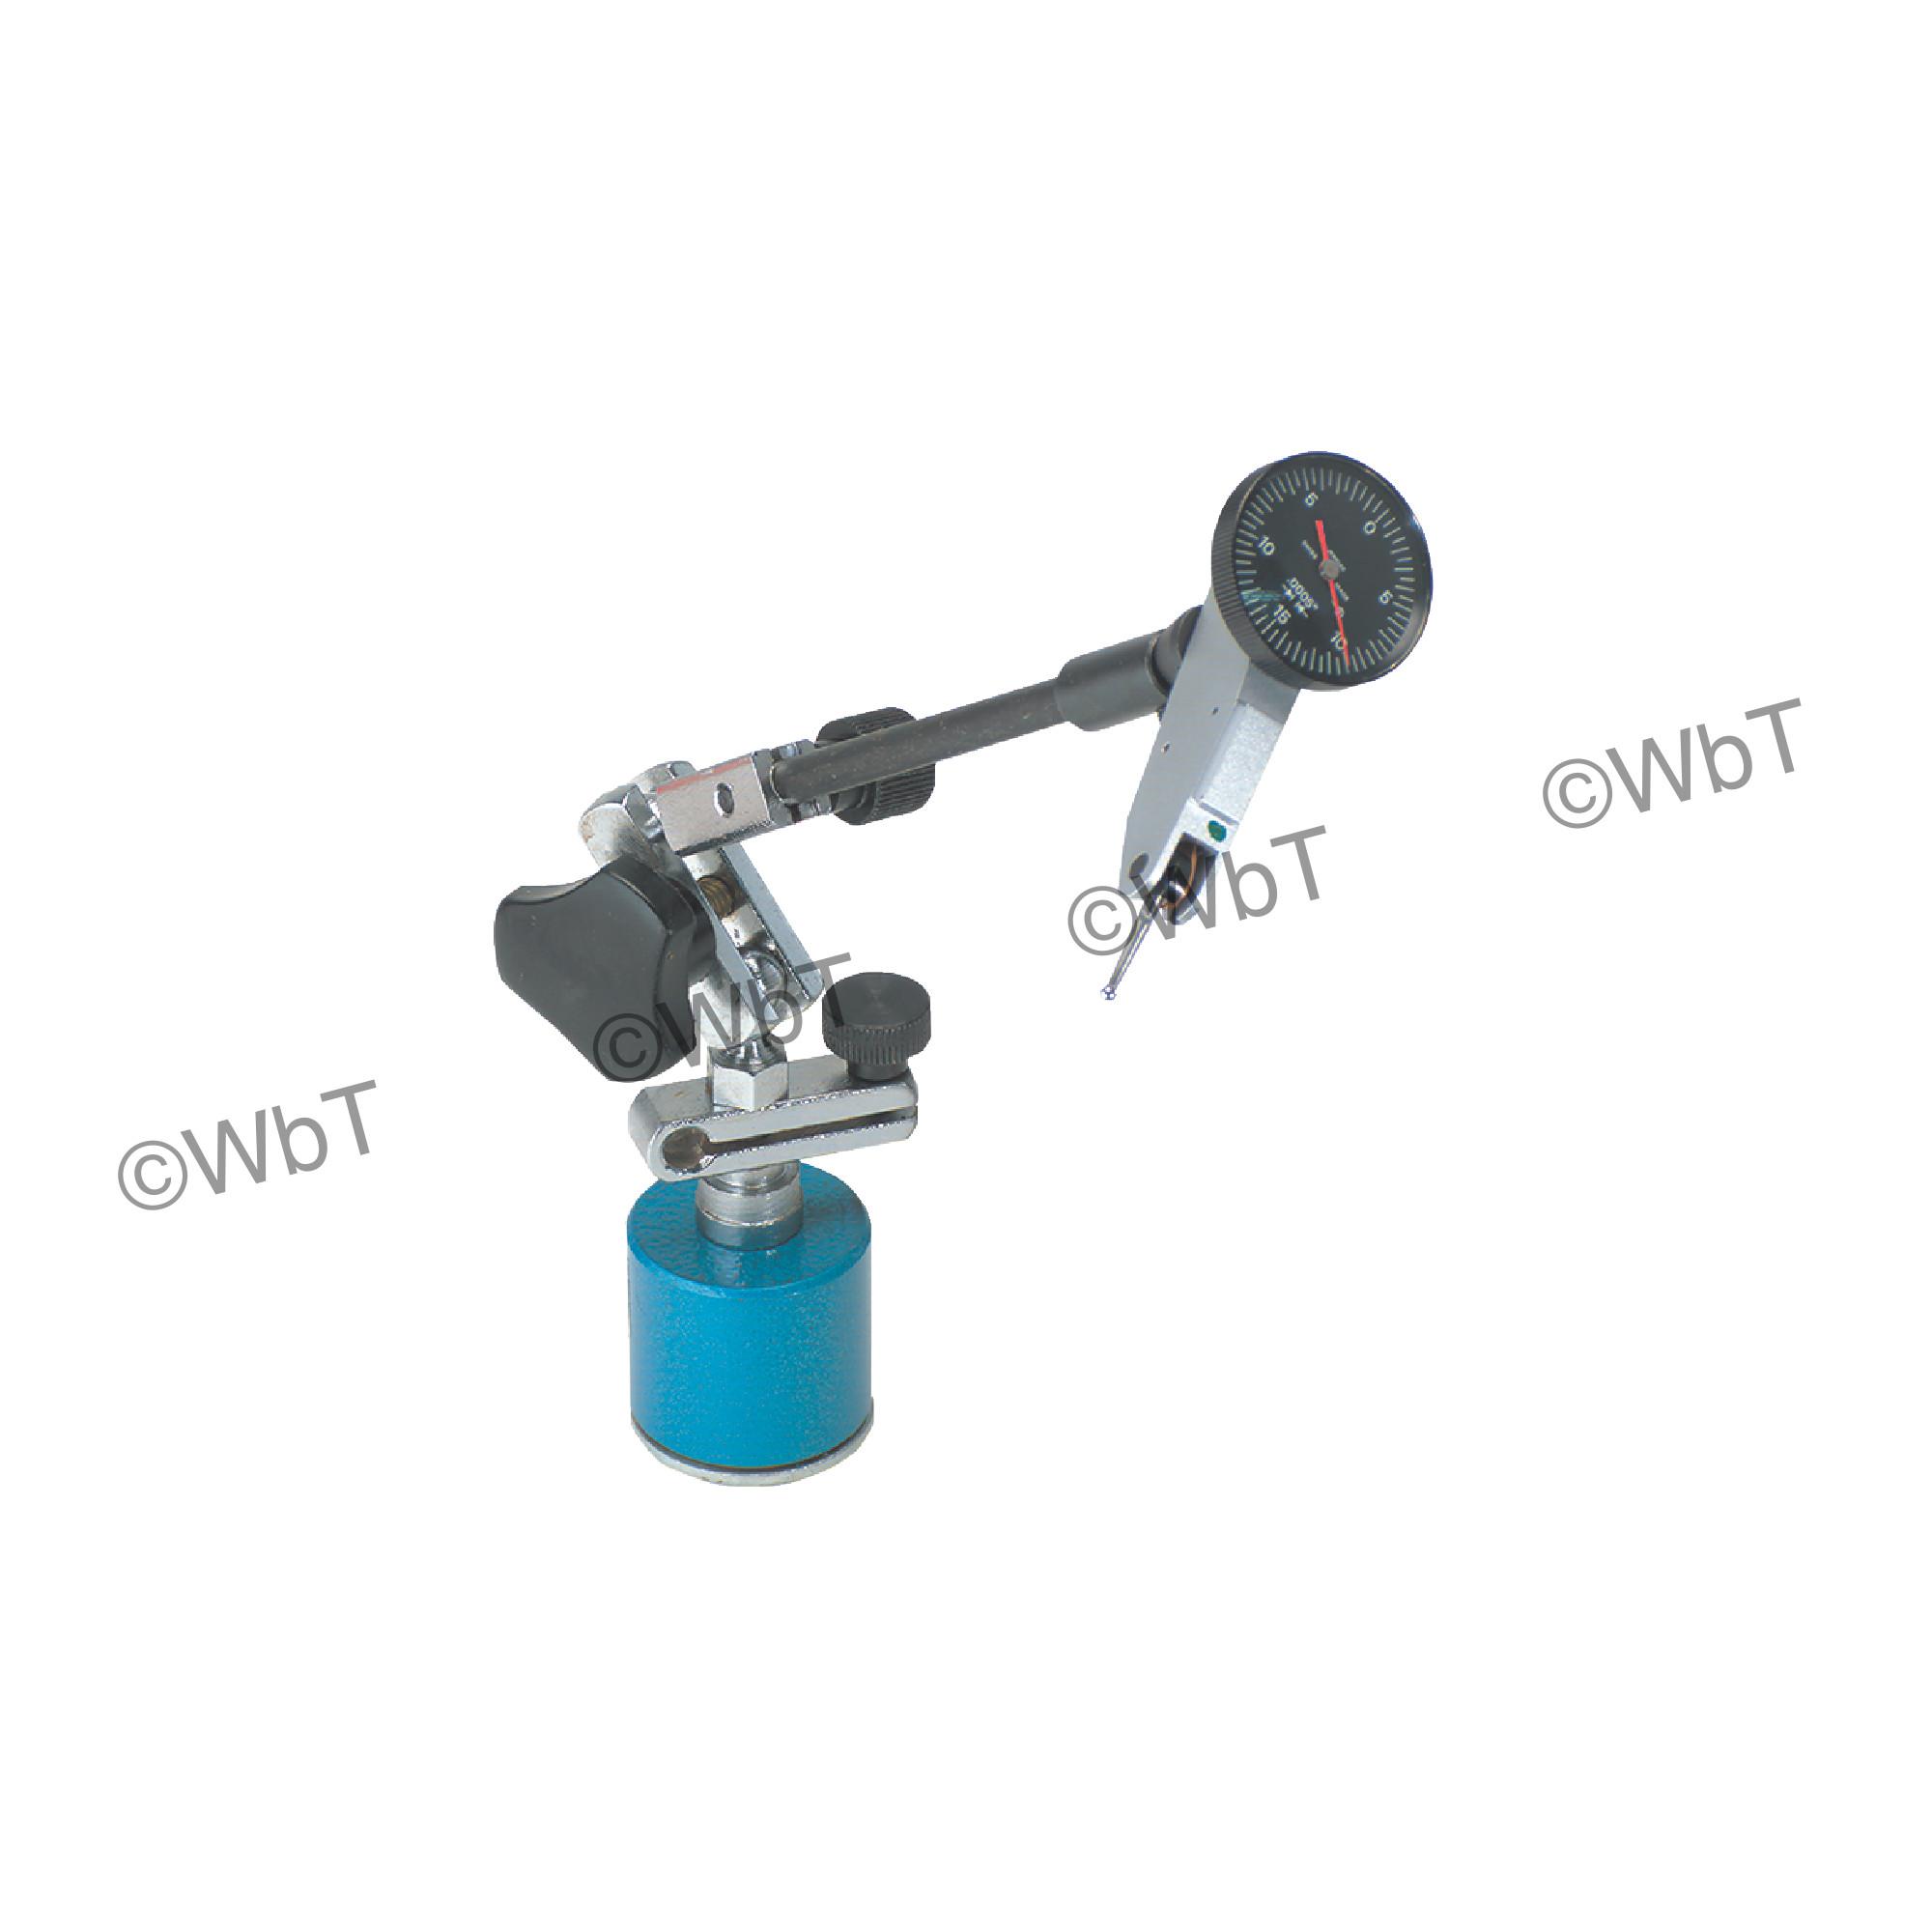 Dial Test Indicator & Magnetic Base Set